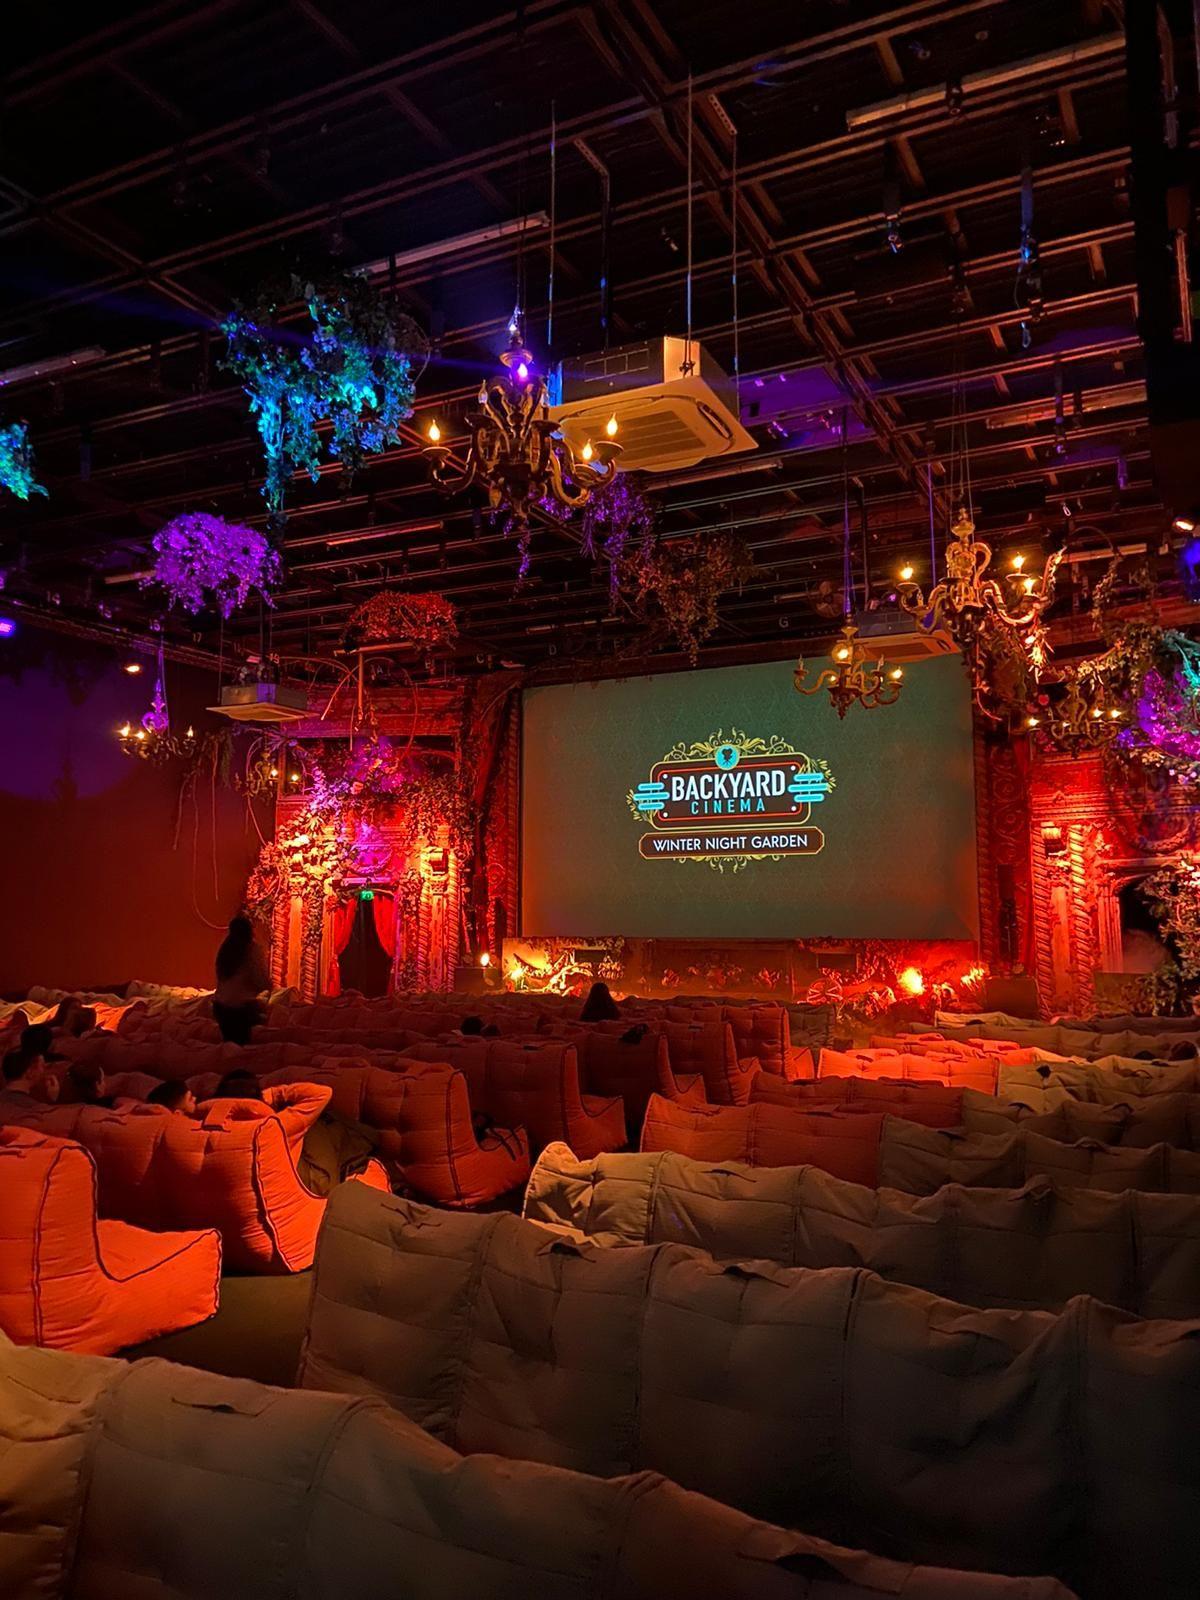 Image may contain: Ballroom, Stage, Theater, Hall, Auditorium, Lighting, Room, Indoors, Interior Design